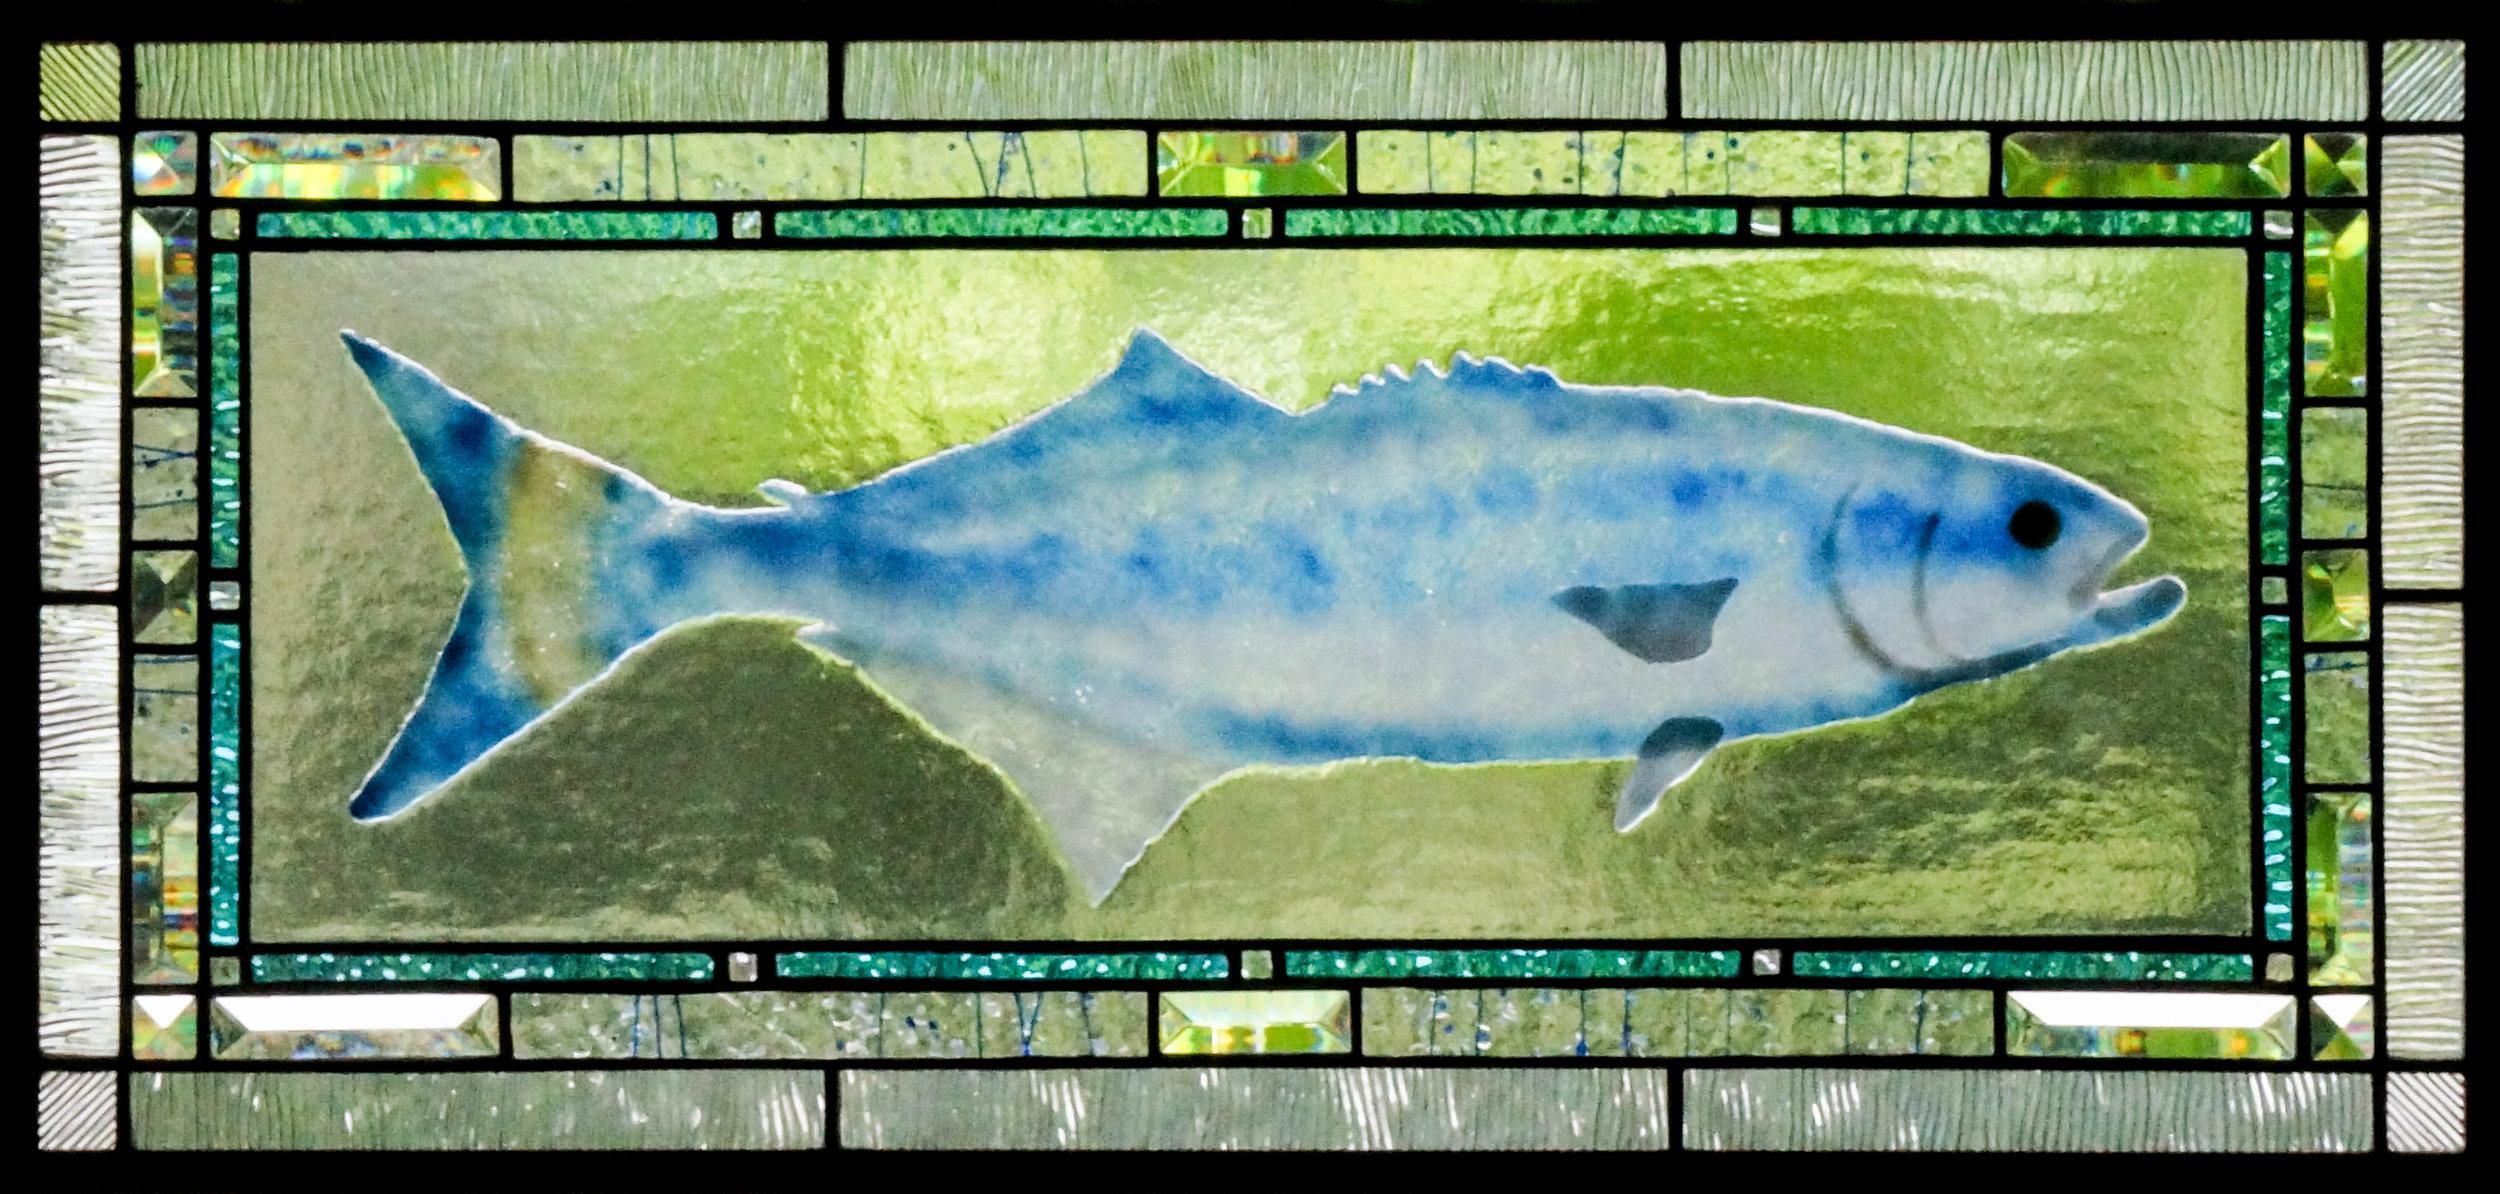 Fish - Blue Fish - large.jpg